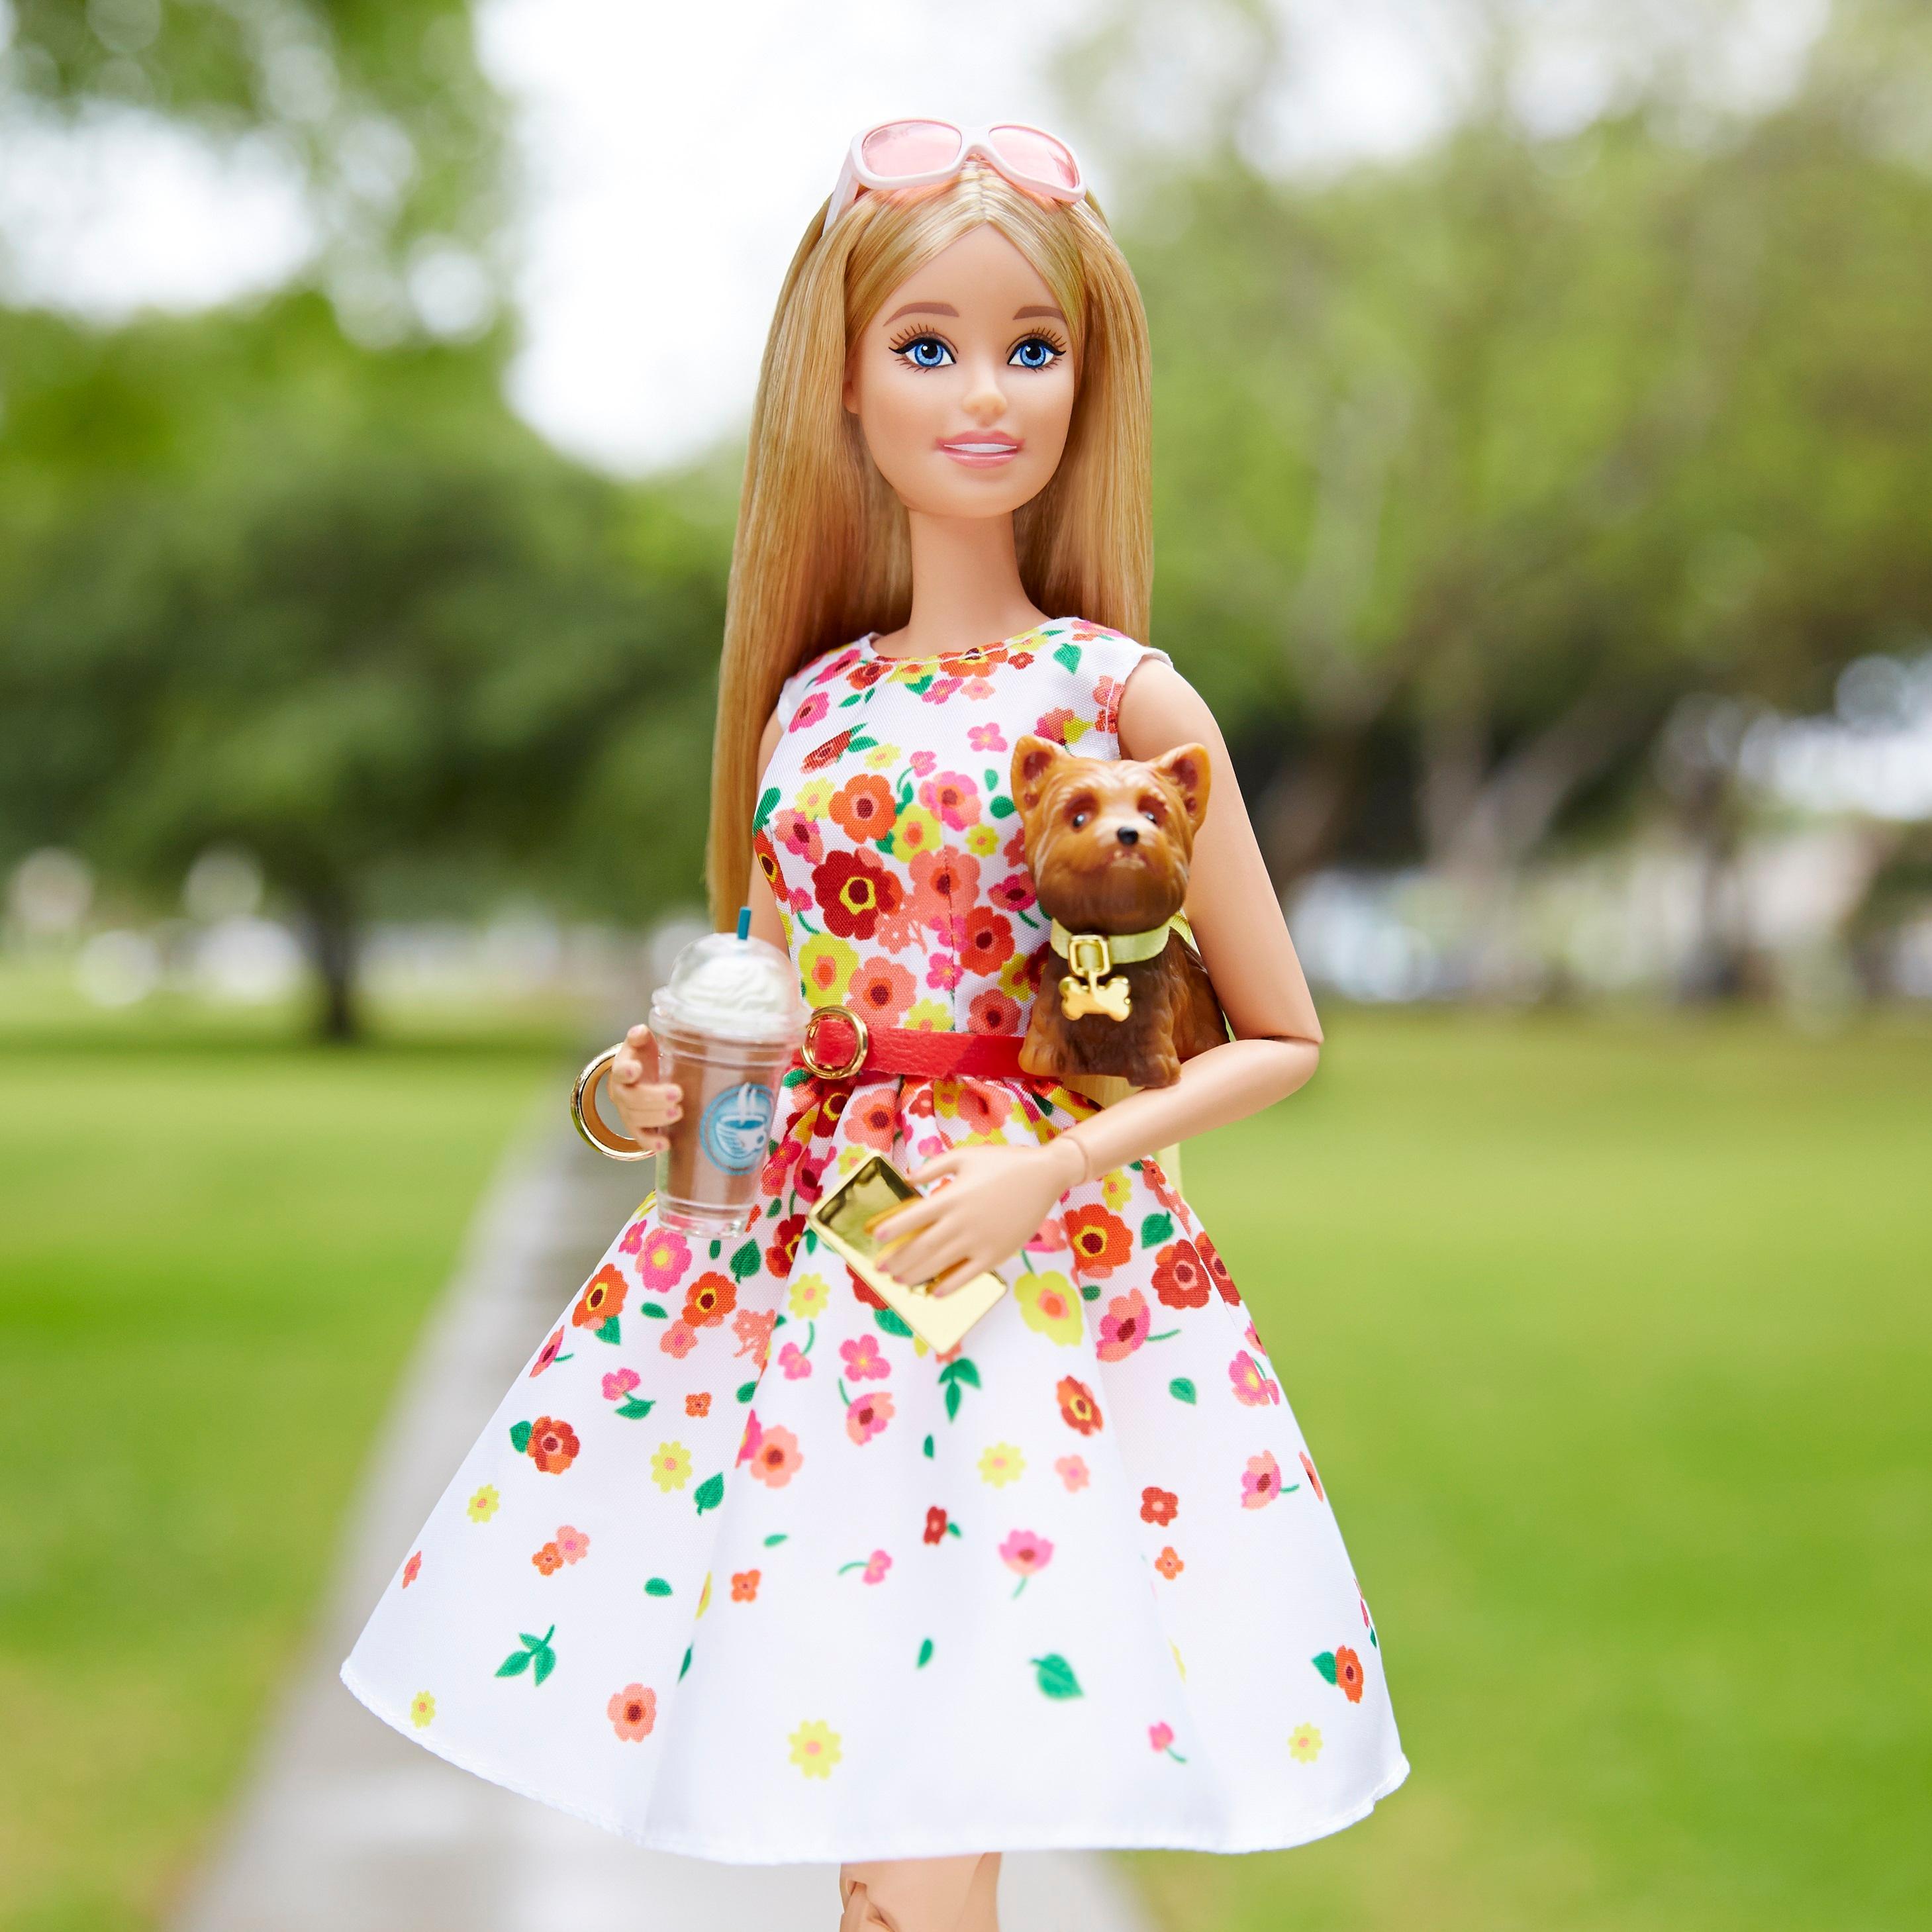 Amazon.com: Barbie Look Collector Barbie Doll - Park